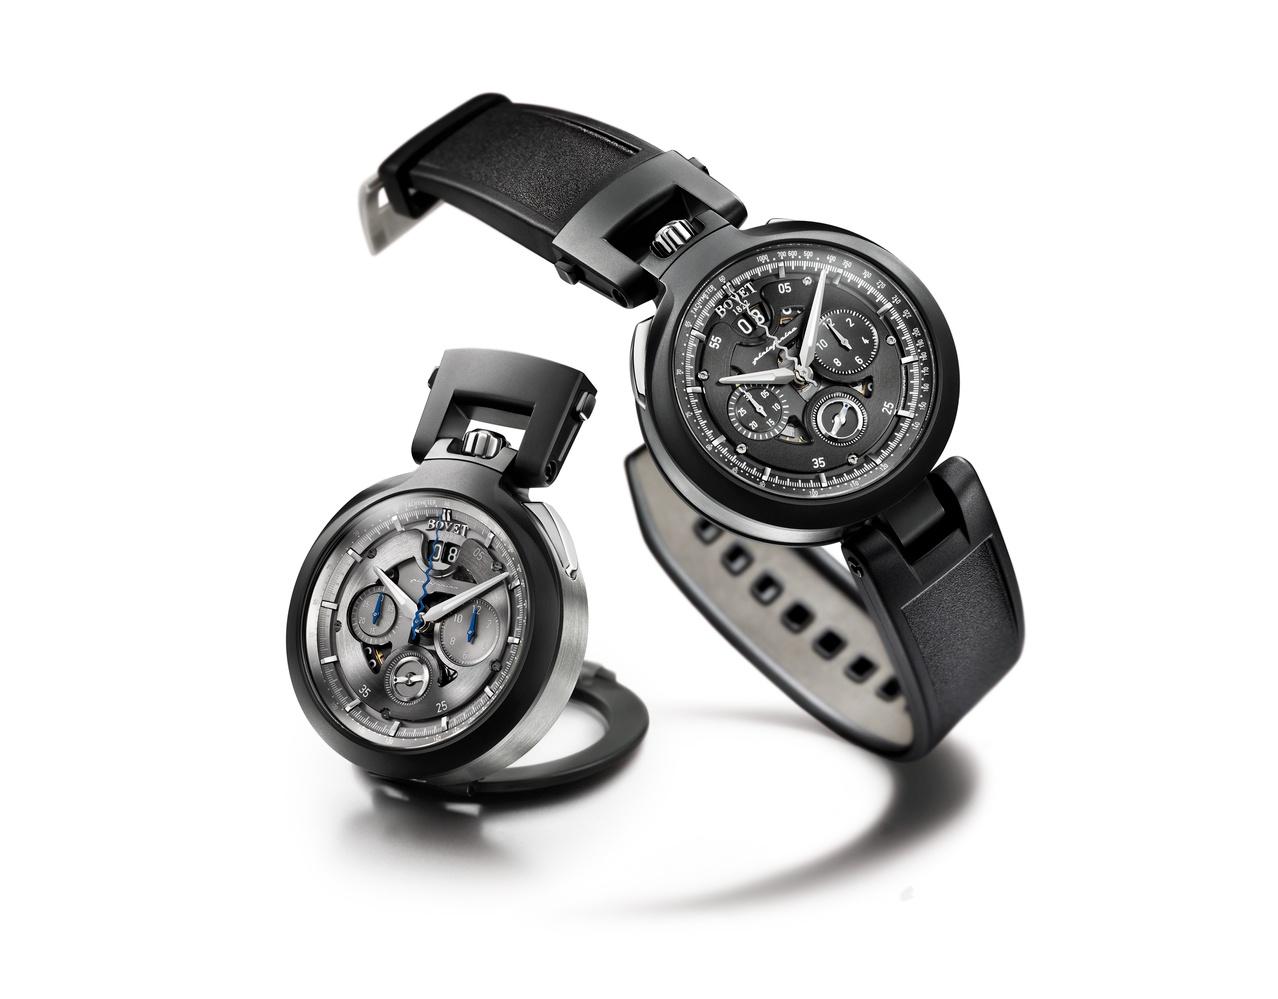 Bovet Watch   BOVET by Pininfarina   Ref. Nr.  CHPIN001    Call 312-944-3100  | For Availability